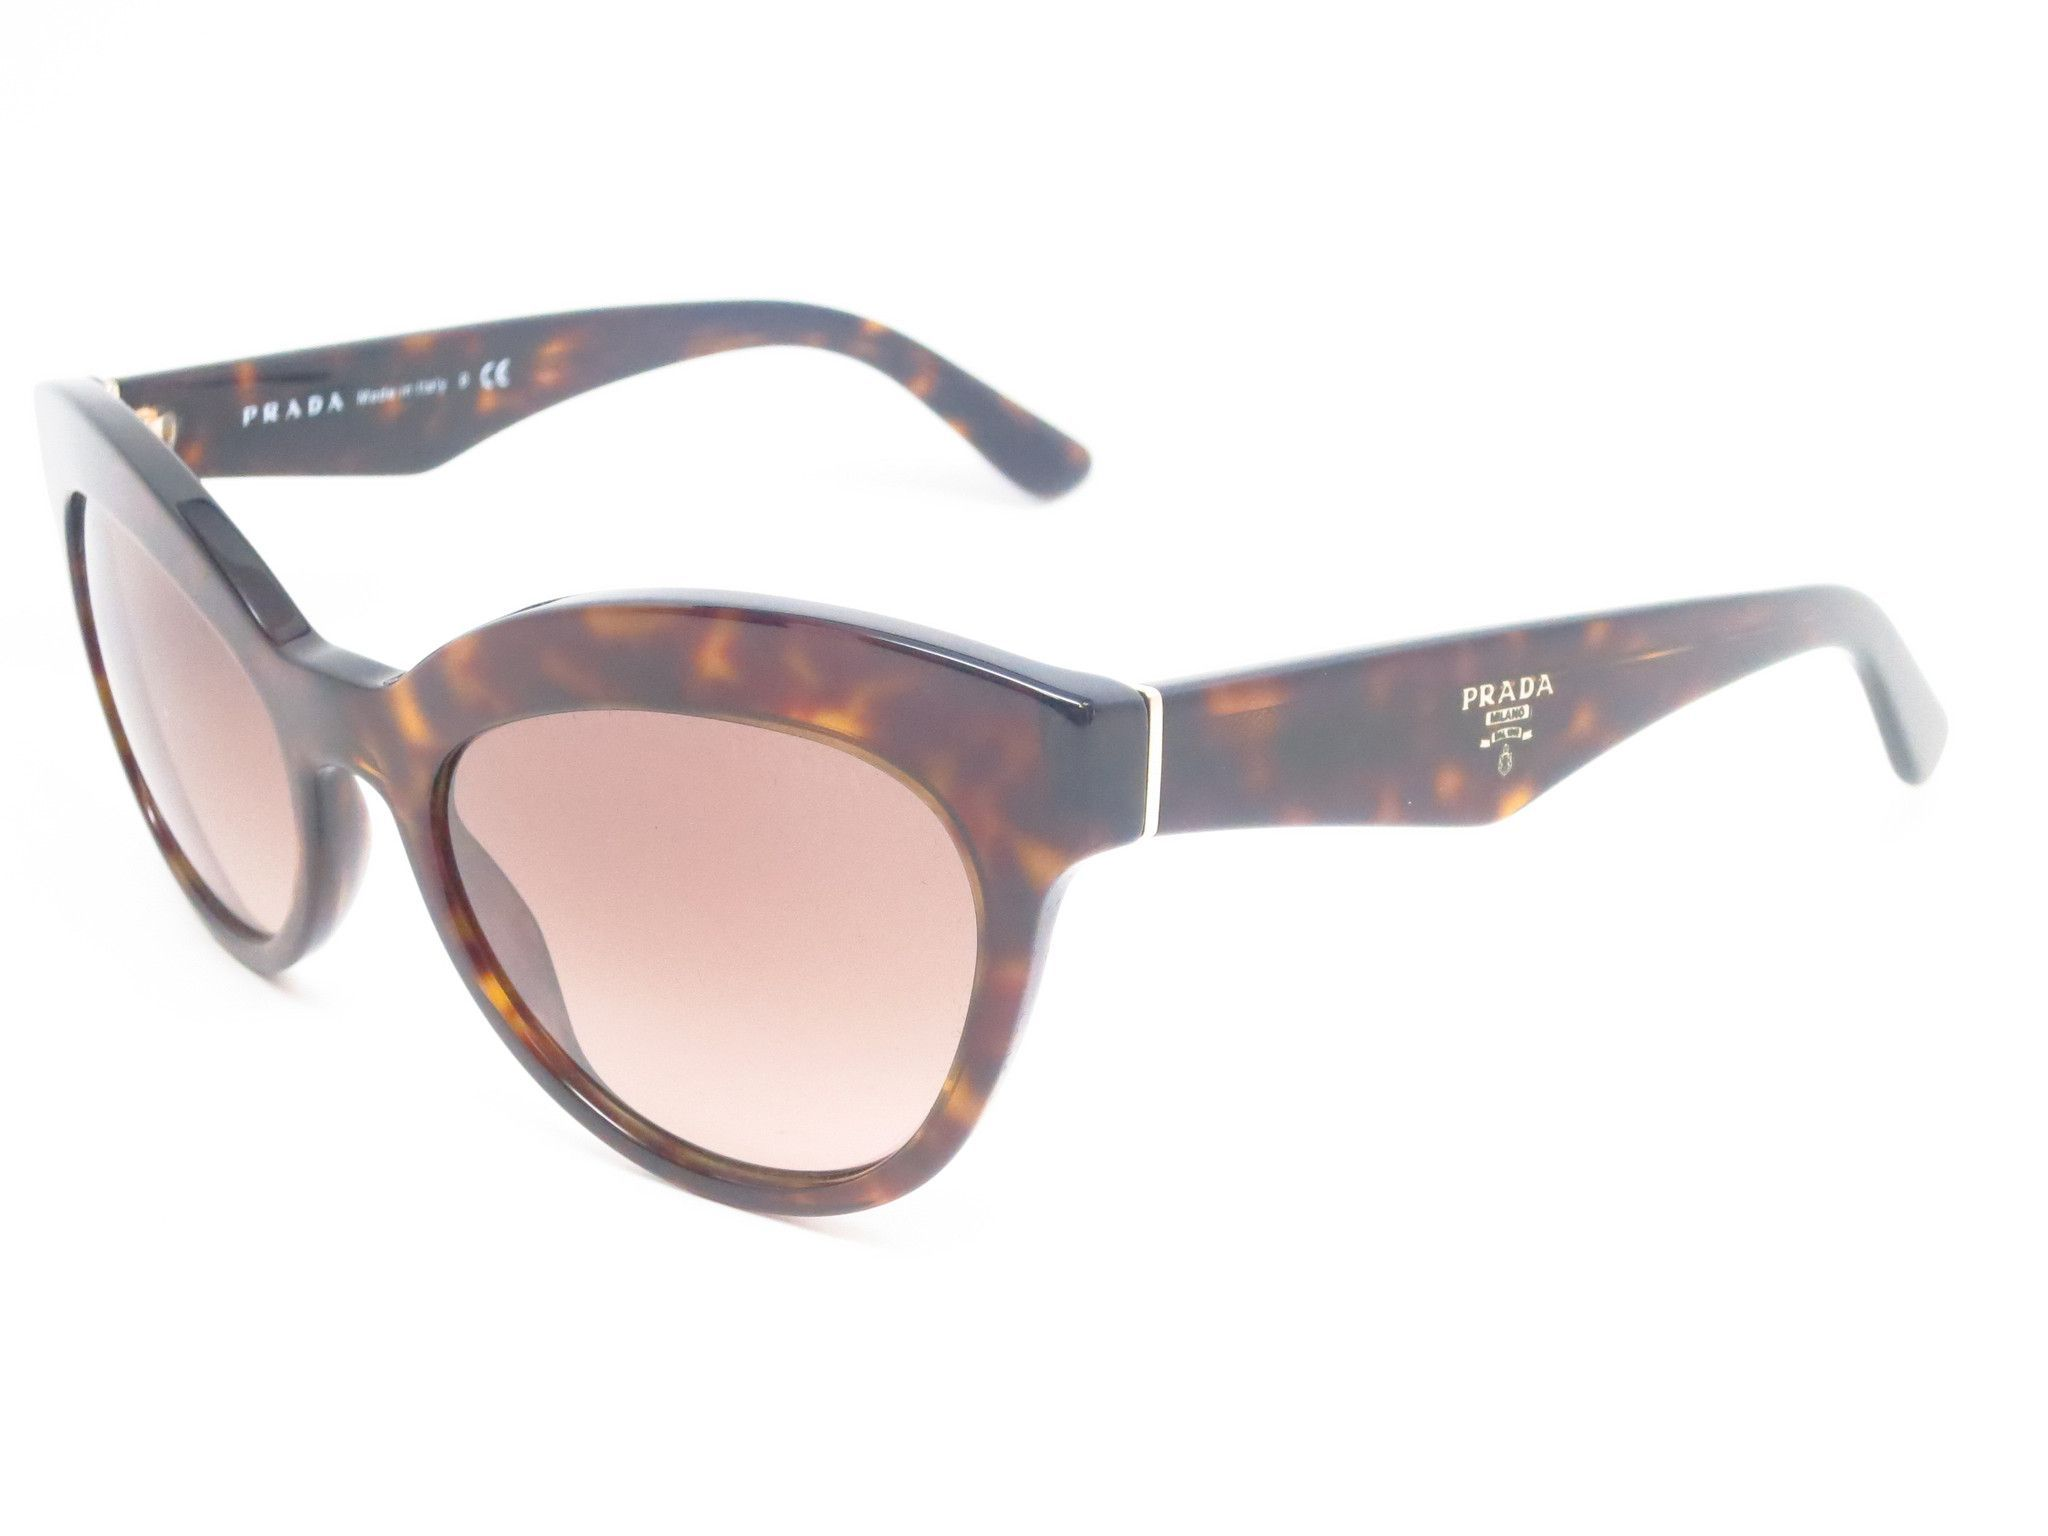 b740effcd1728 where can i buy prada sunglasses men spr 32p havana 2au a474b 9b155